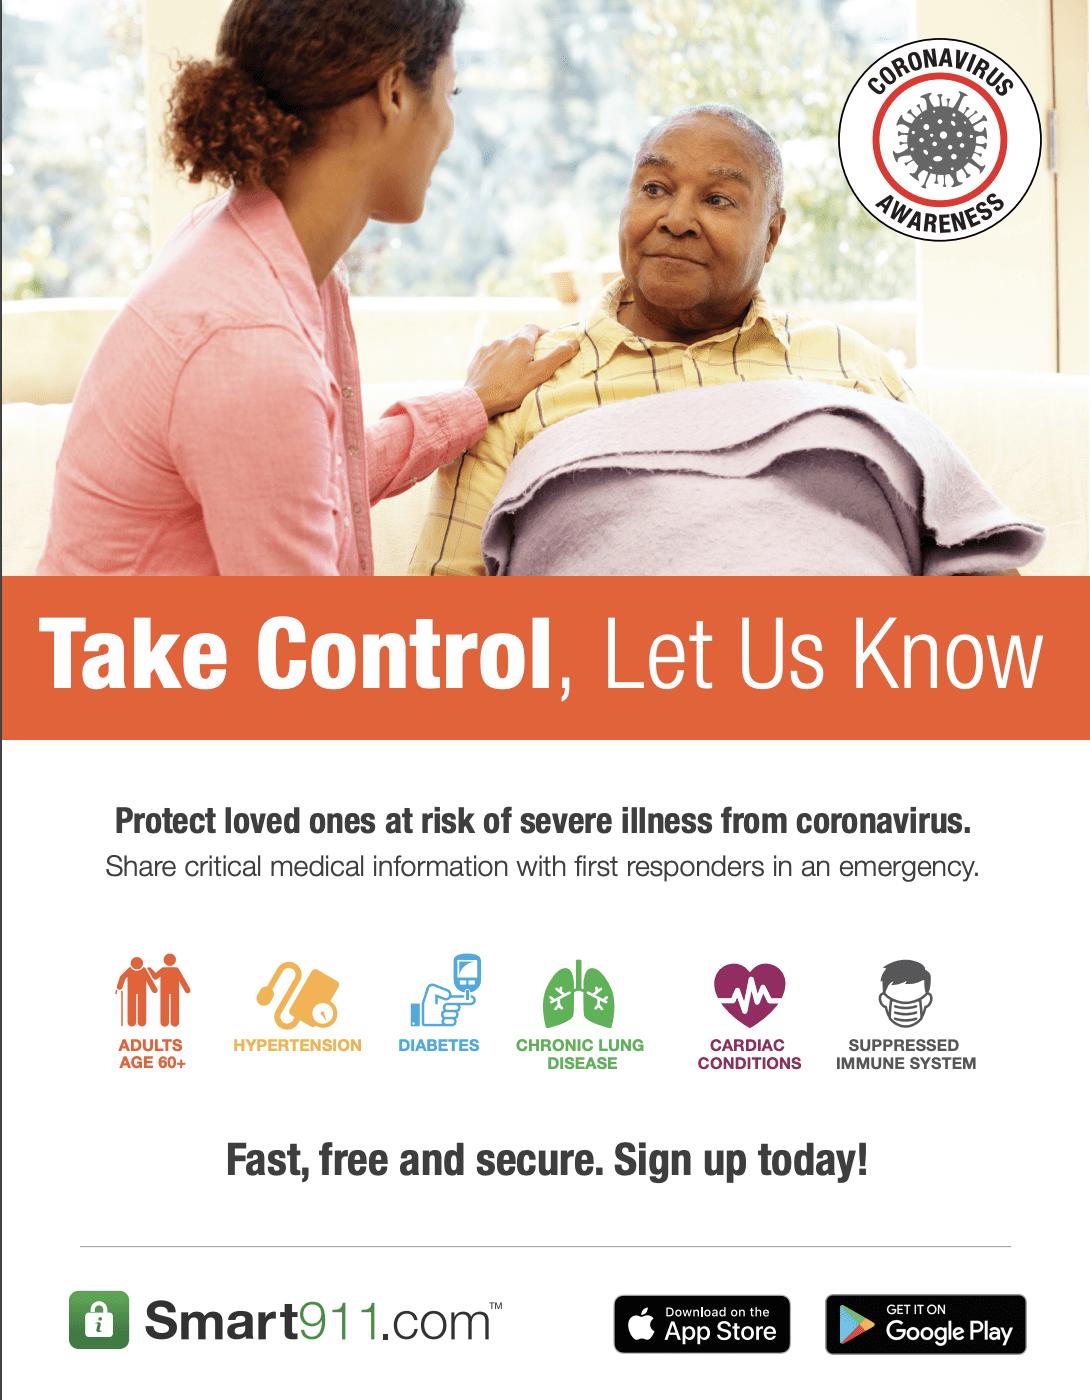 Smart911 Flyers – Coronavirus